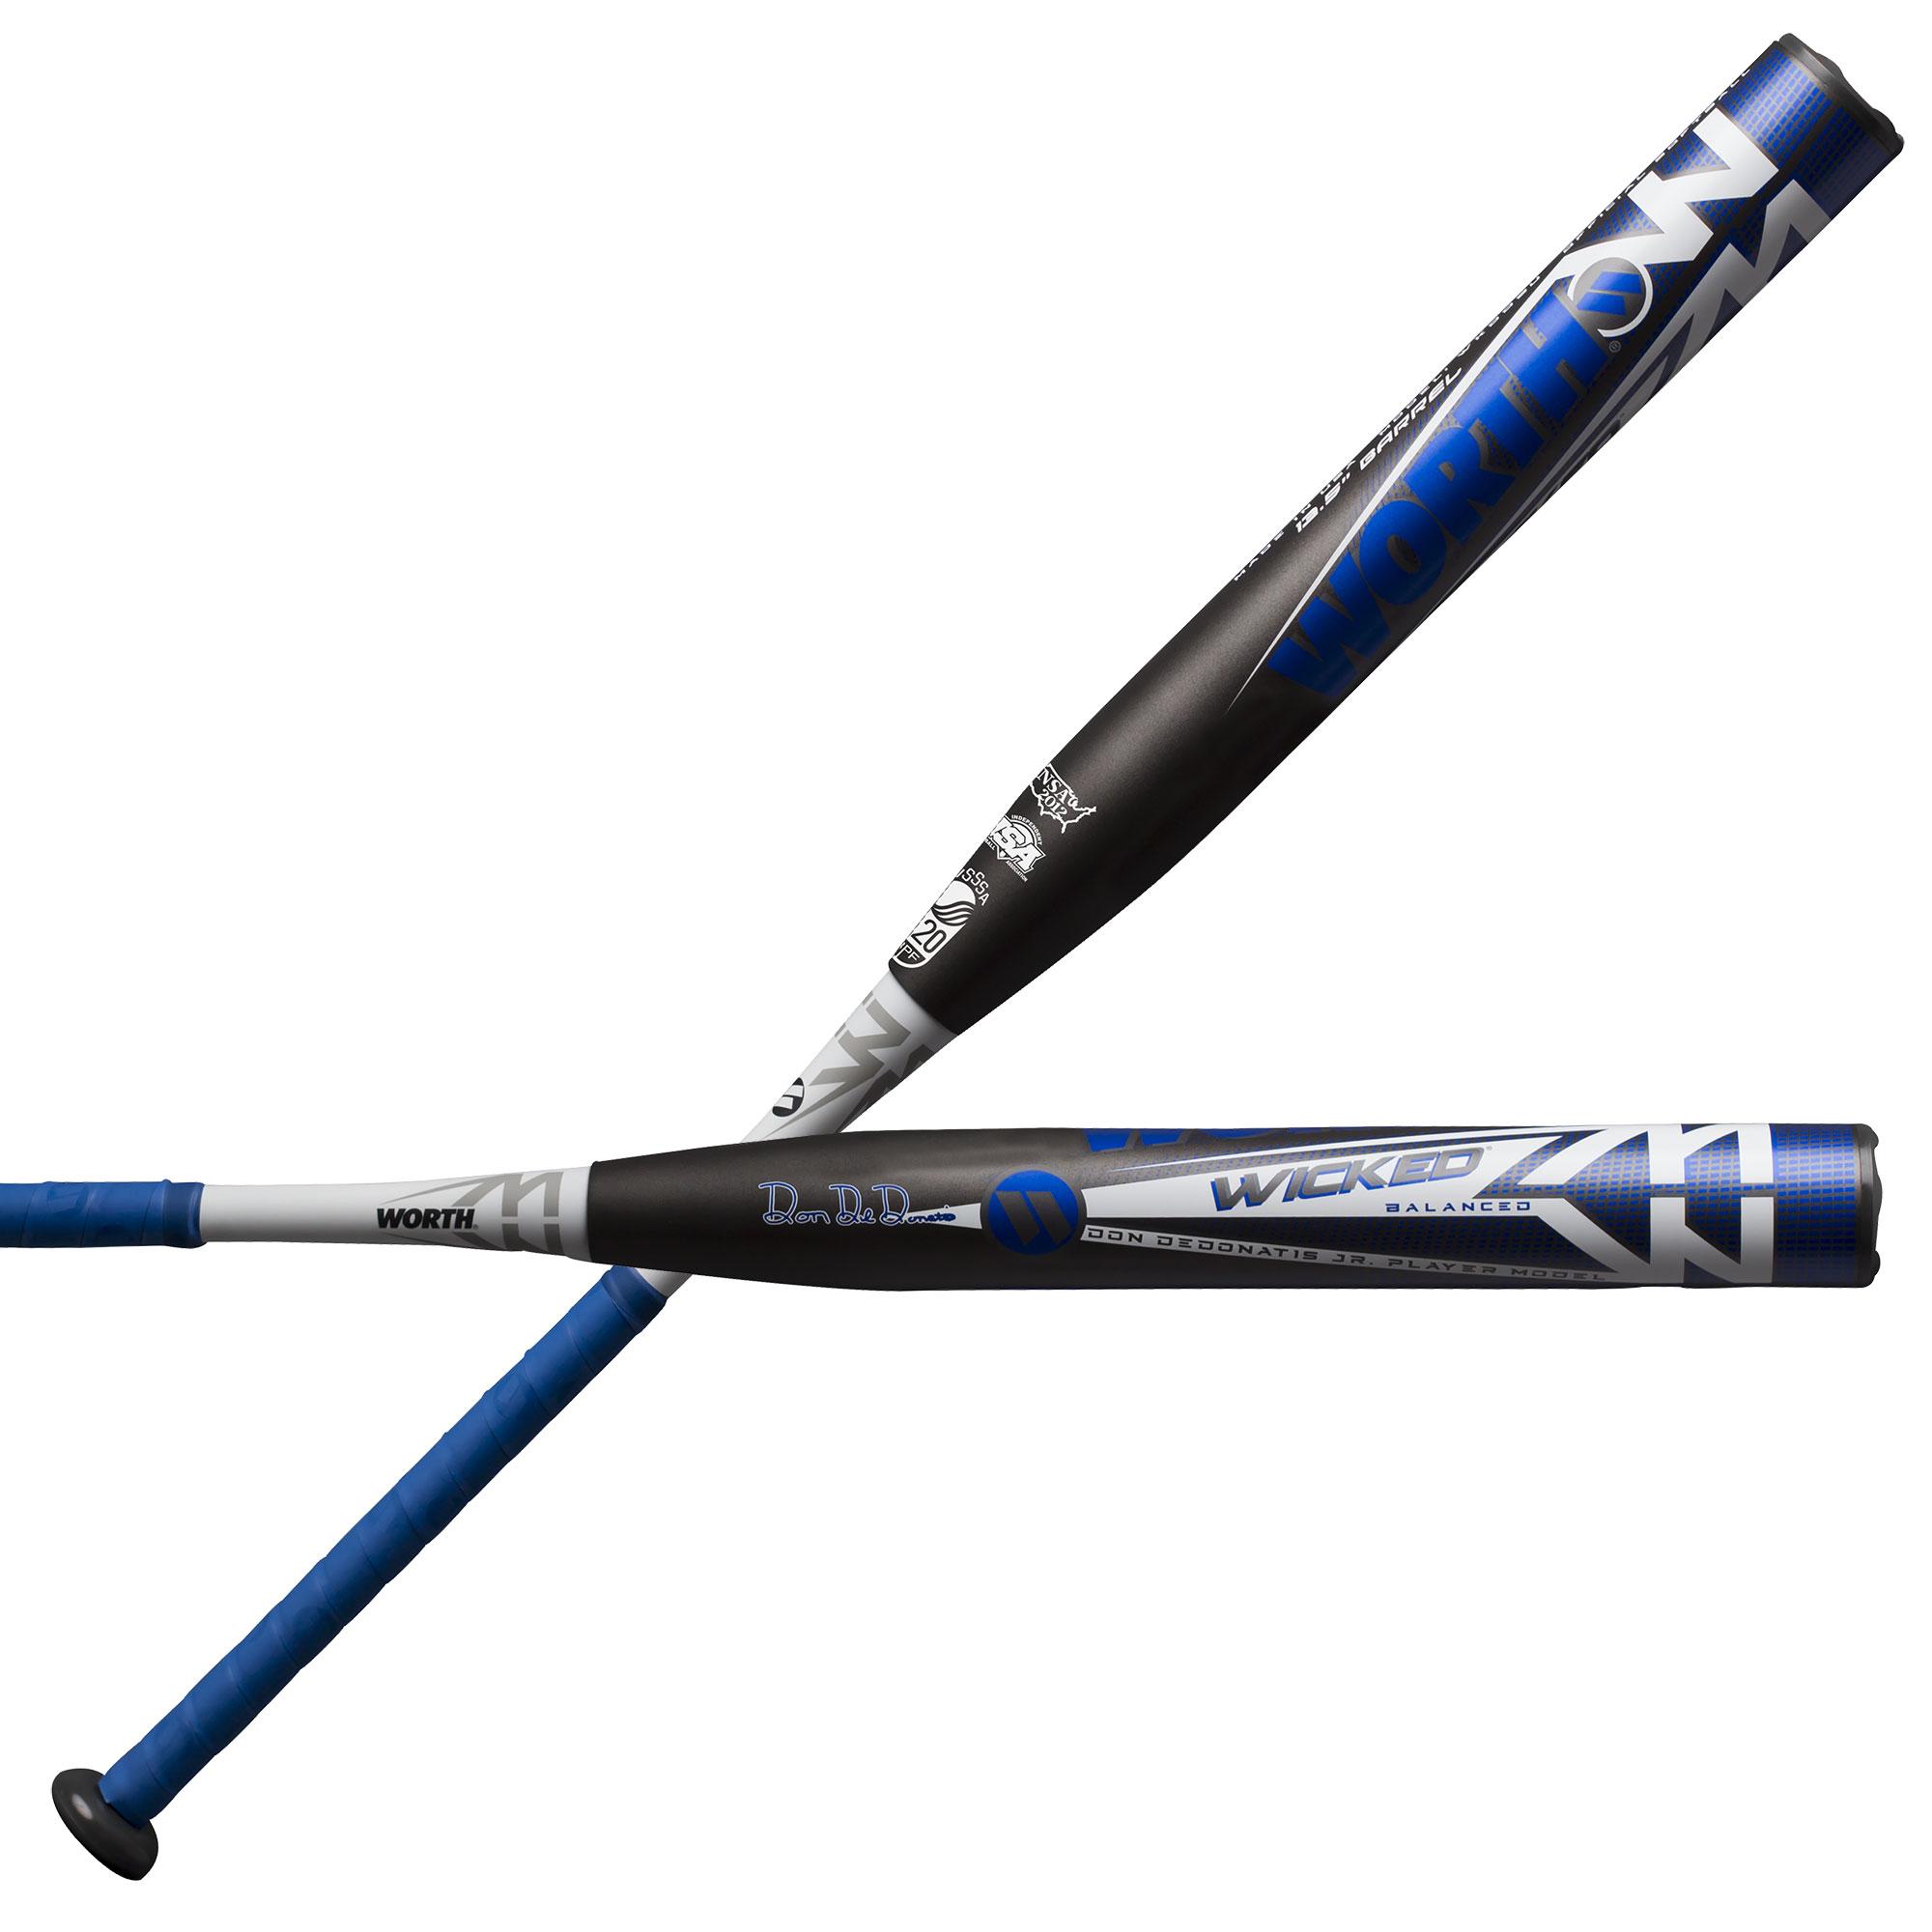 Worth Wicked Balanced Don DeDonatis USSSA WKDDBU Slowpitch Softball Bat